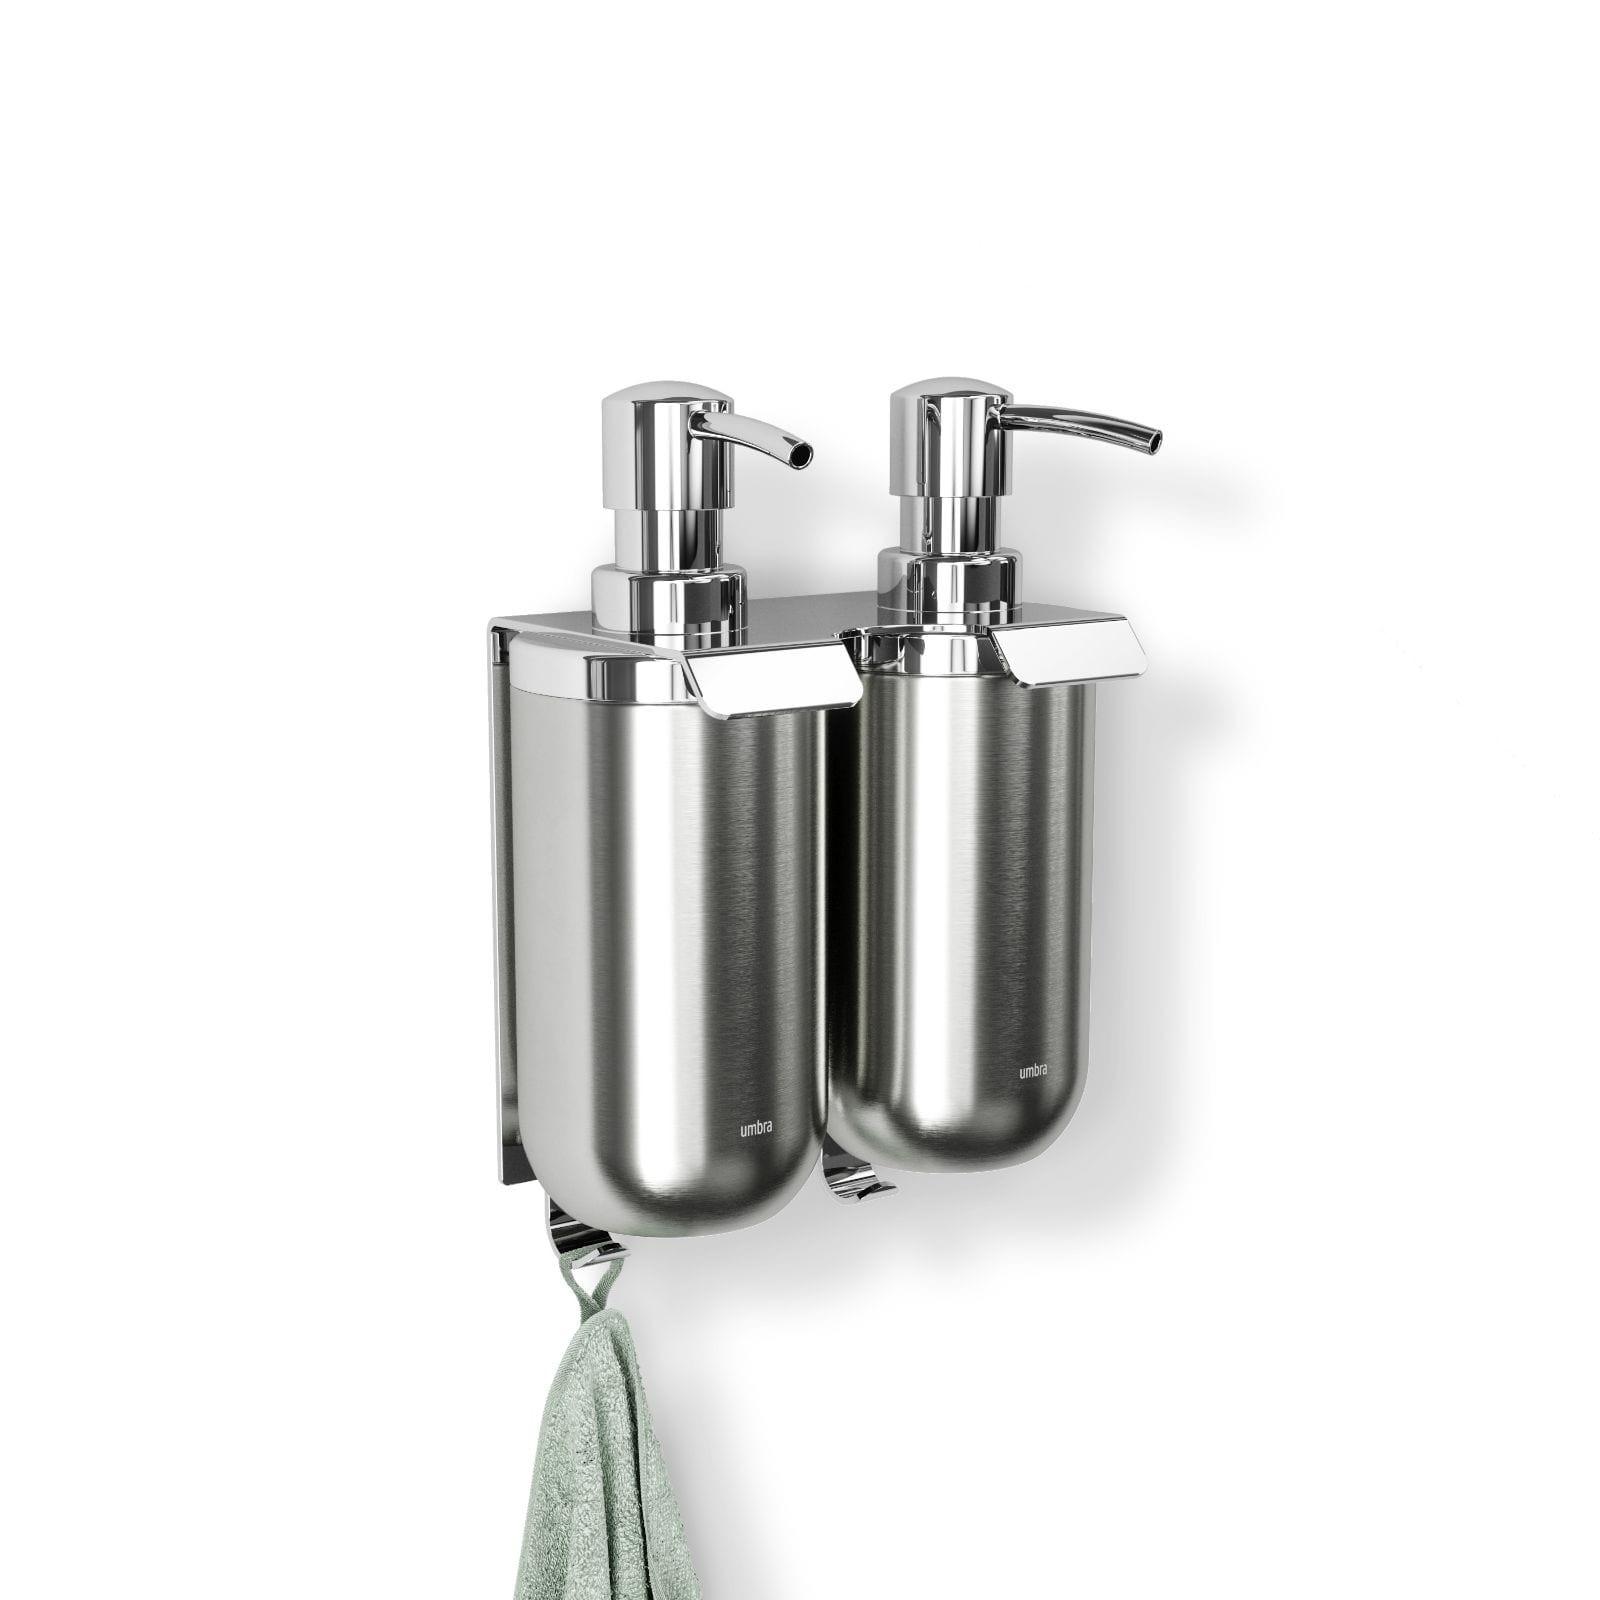 Junip Wall Mounted Soap Pump Set of 2 (Stainless Steel) - Umbra